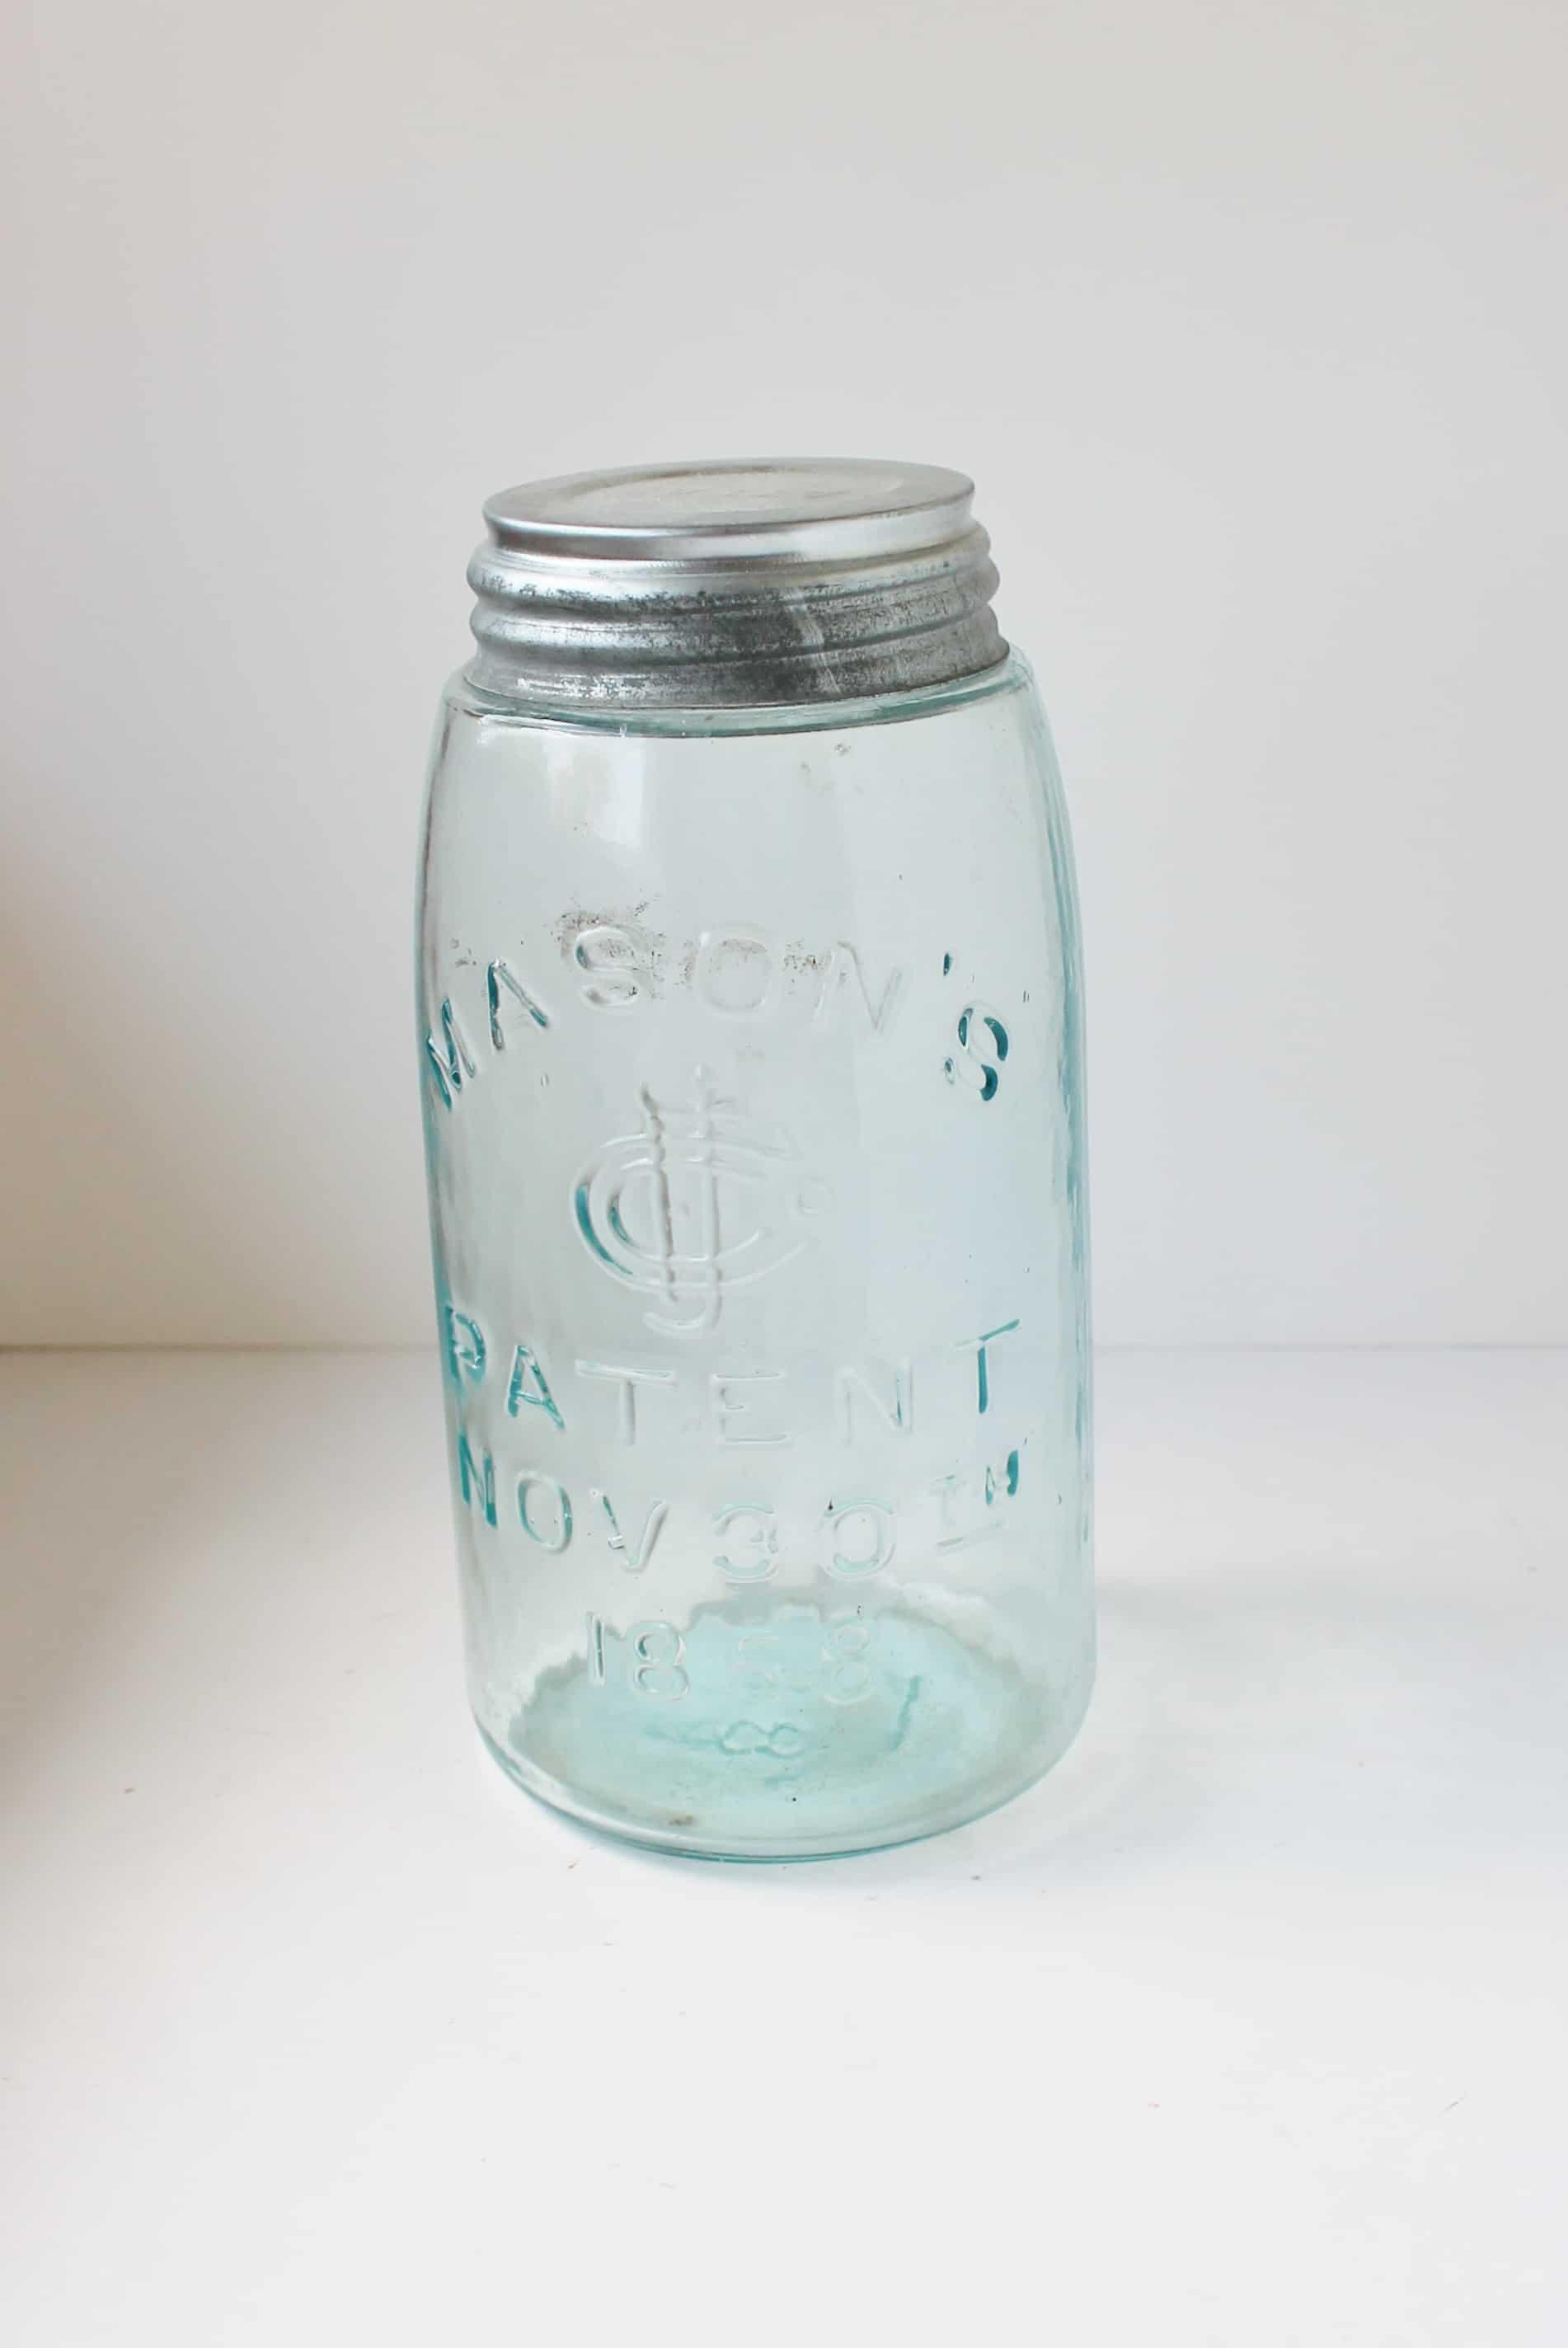 Antique & Vintage Canning Jar Price Guide • Adirondack Girl @ Heart